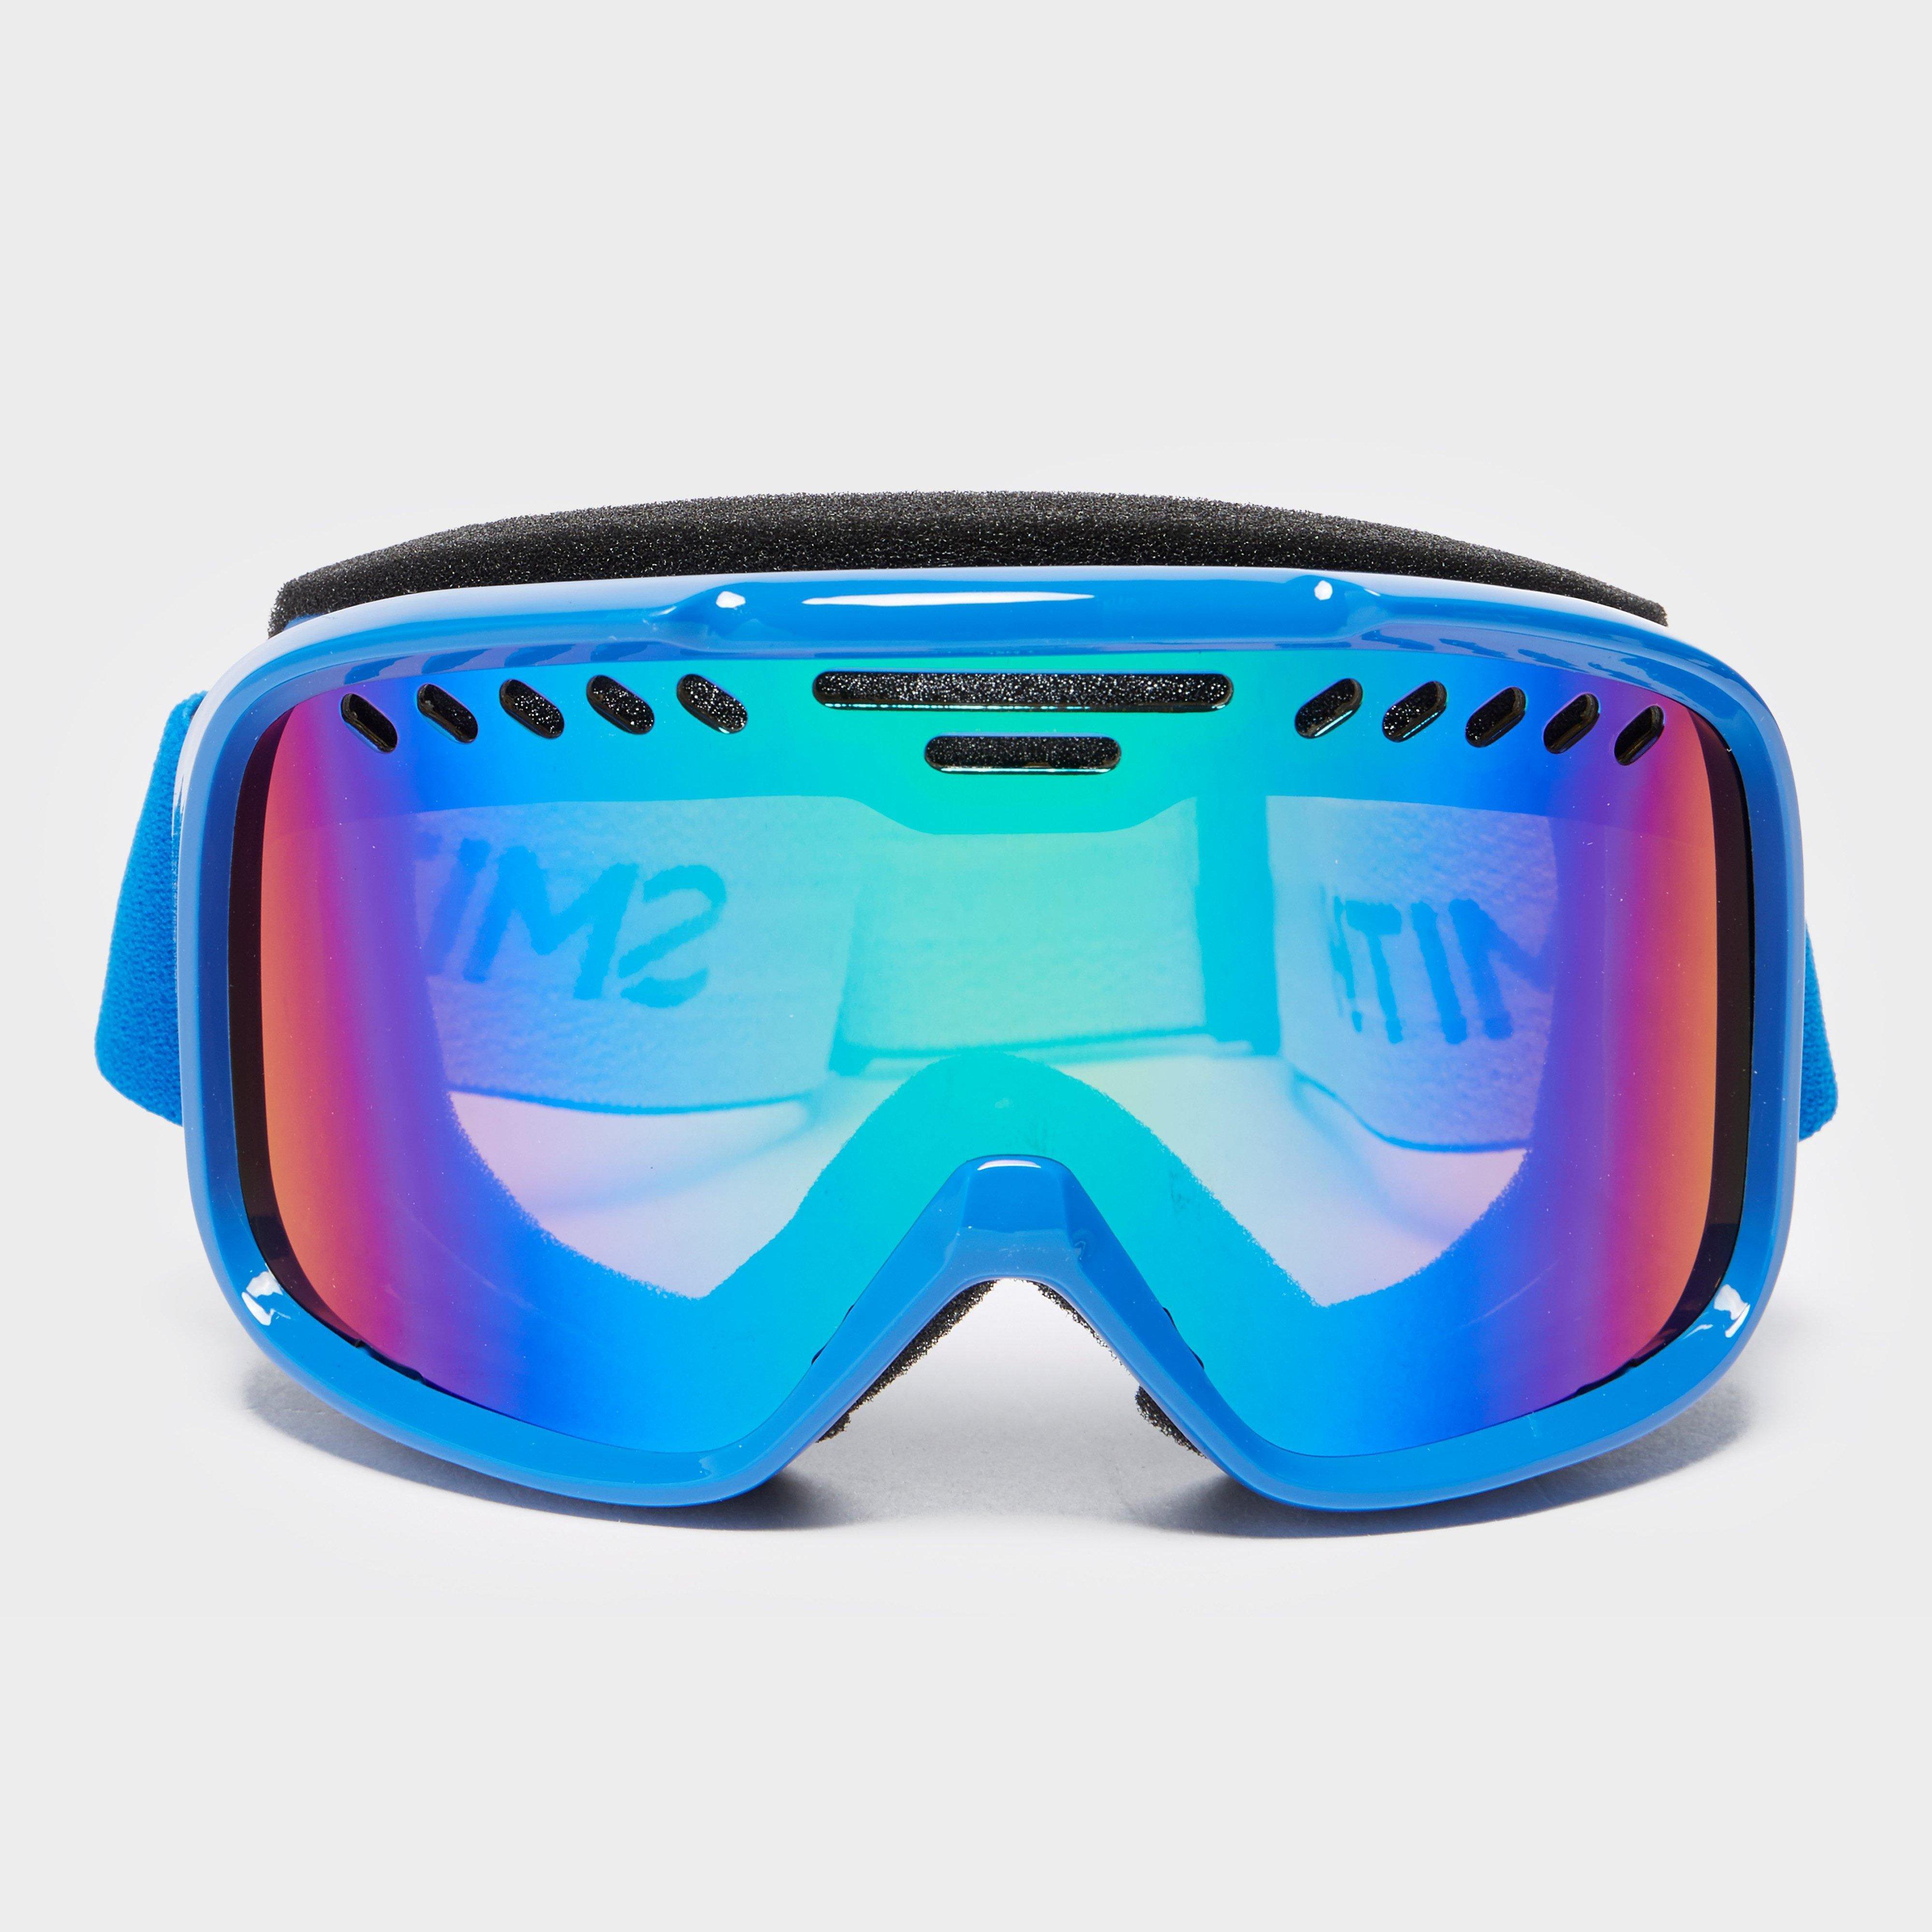 Smith Smith Mens Project Ski Goggles - Blue, Blue